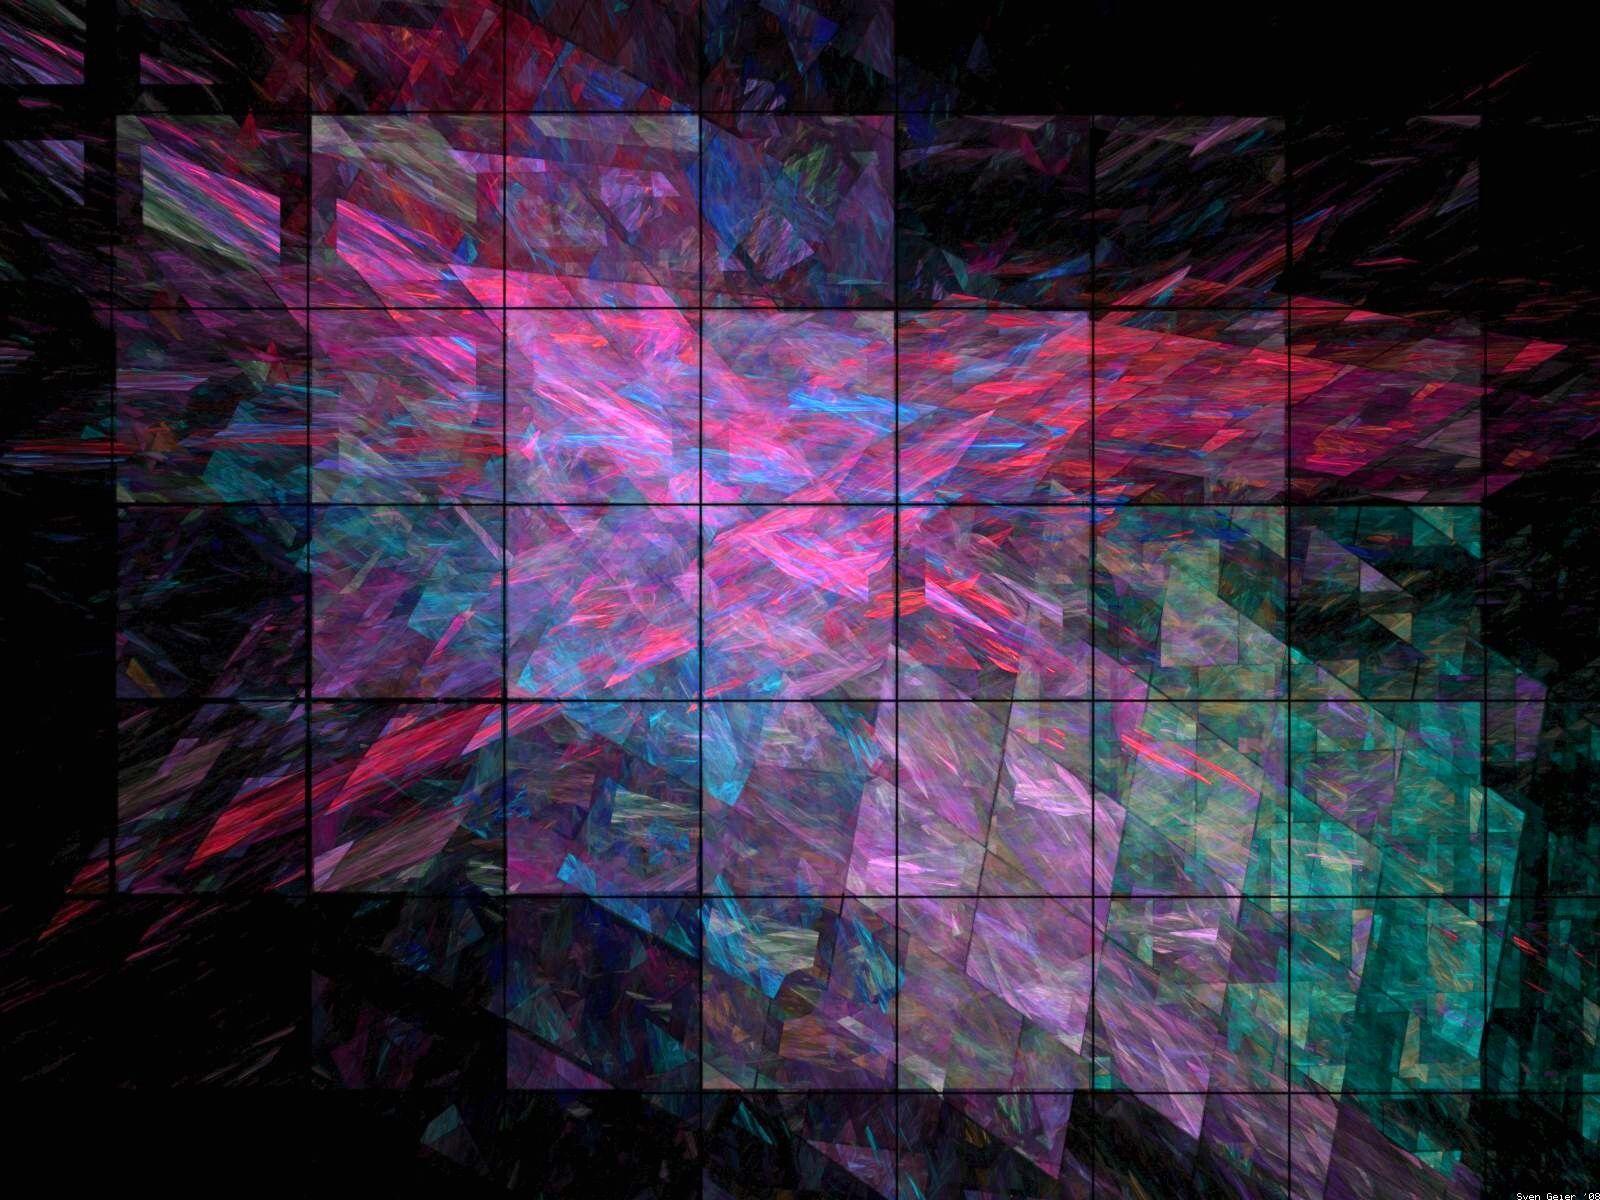 Cubic.jpg (1600×1200)